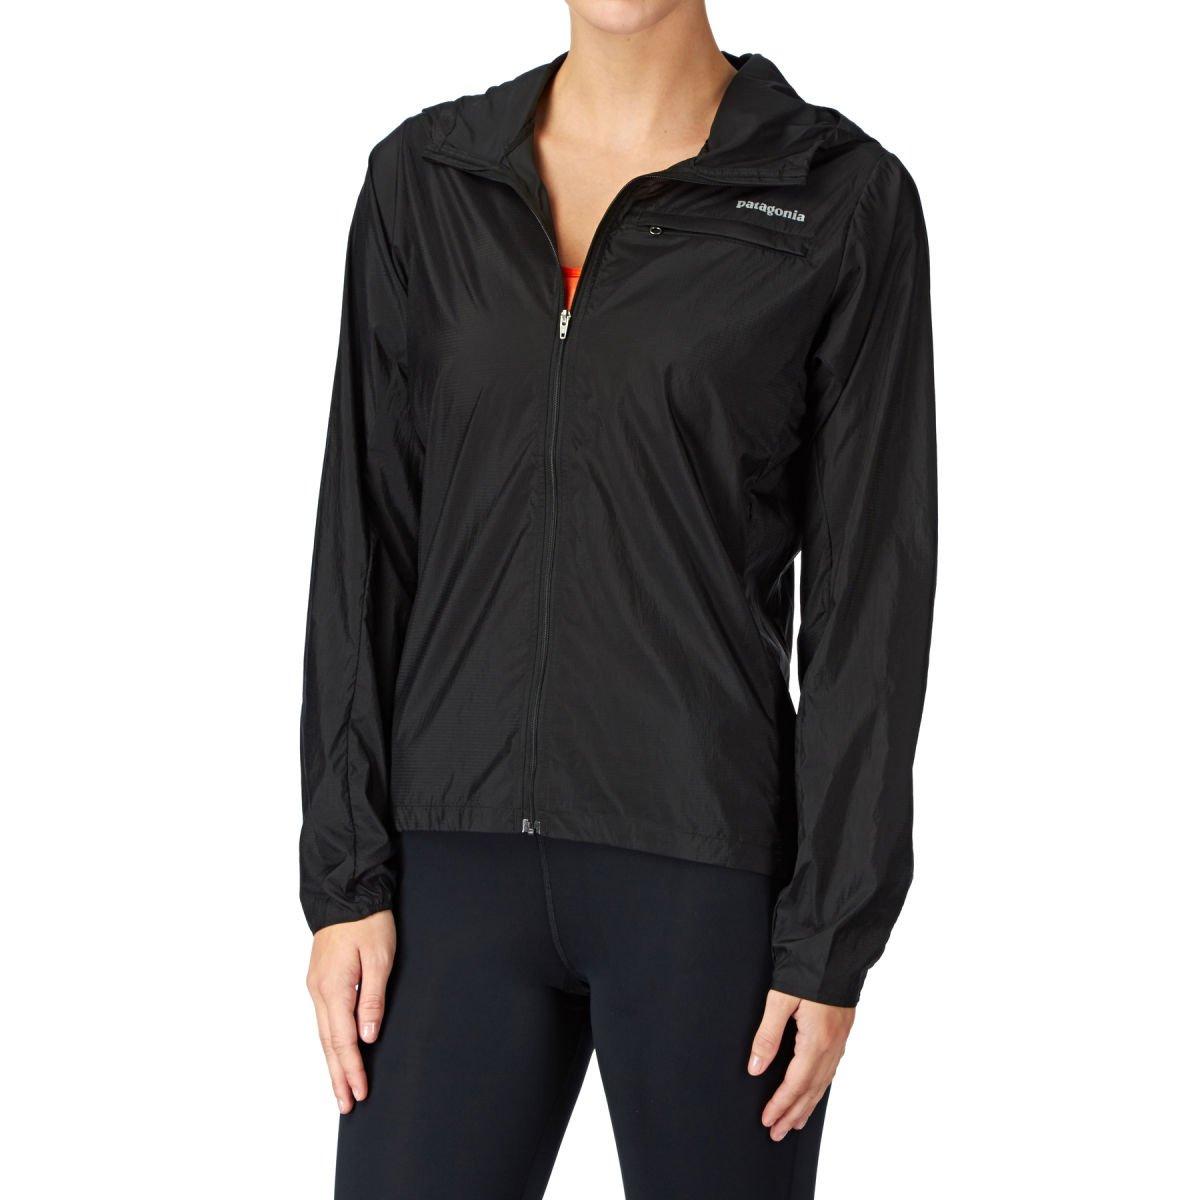 49ce4366b Patagonia Houdini Jacket - Women's Black, S: Amazon.ca: Sports ...